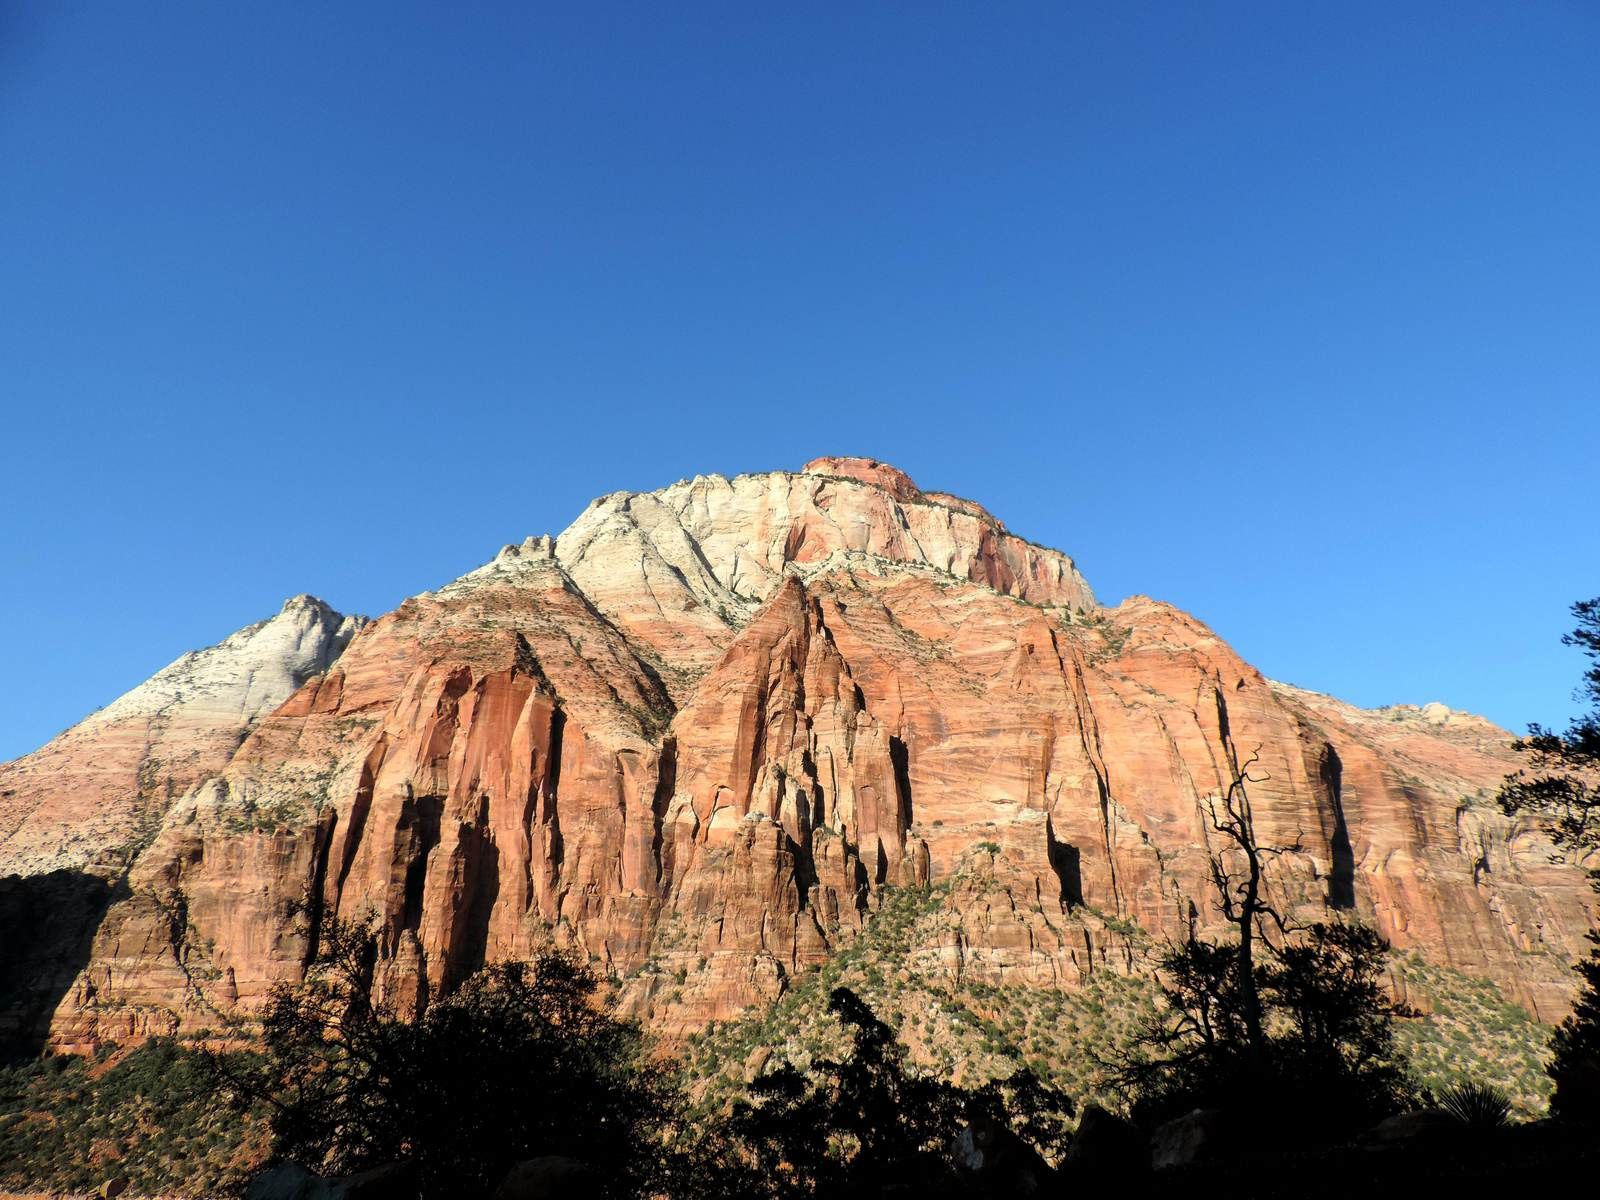 Zion Canyon - Day 10